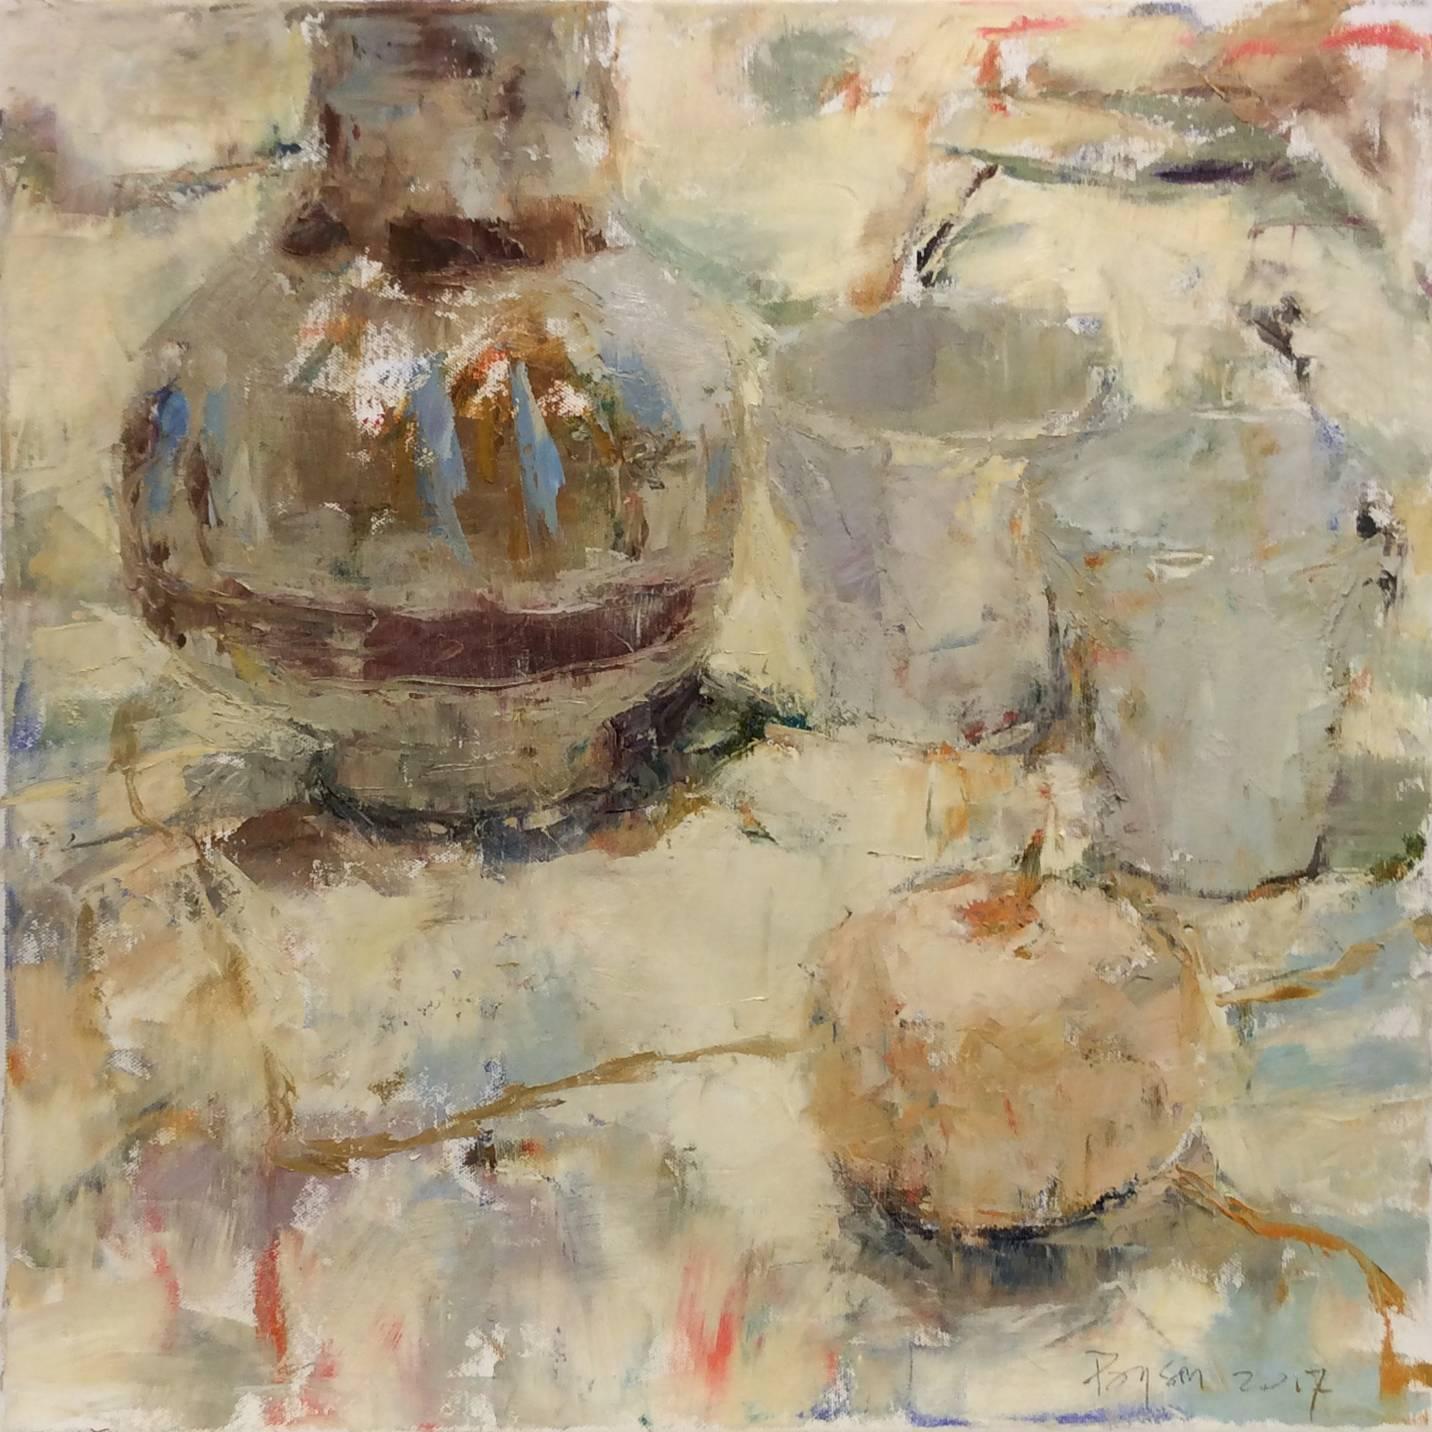 Vase Still Life with Pink Apple (Modern Impressionist Still Life Oil Painting)